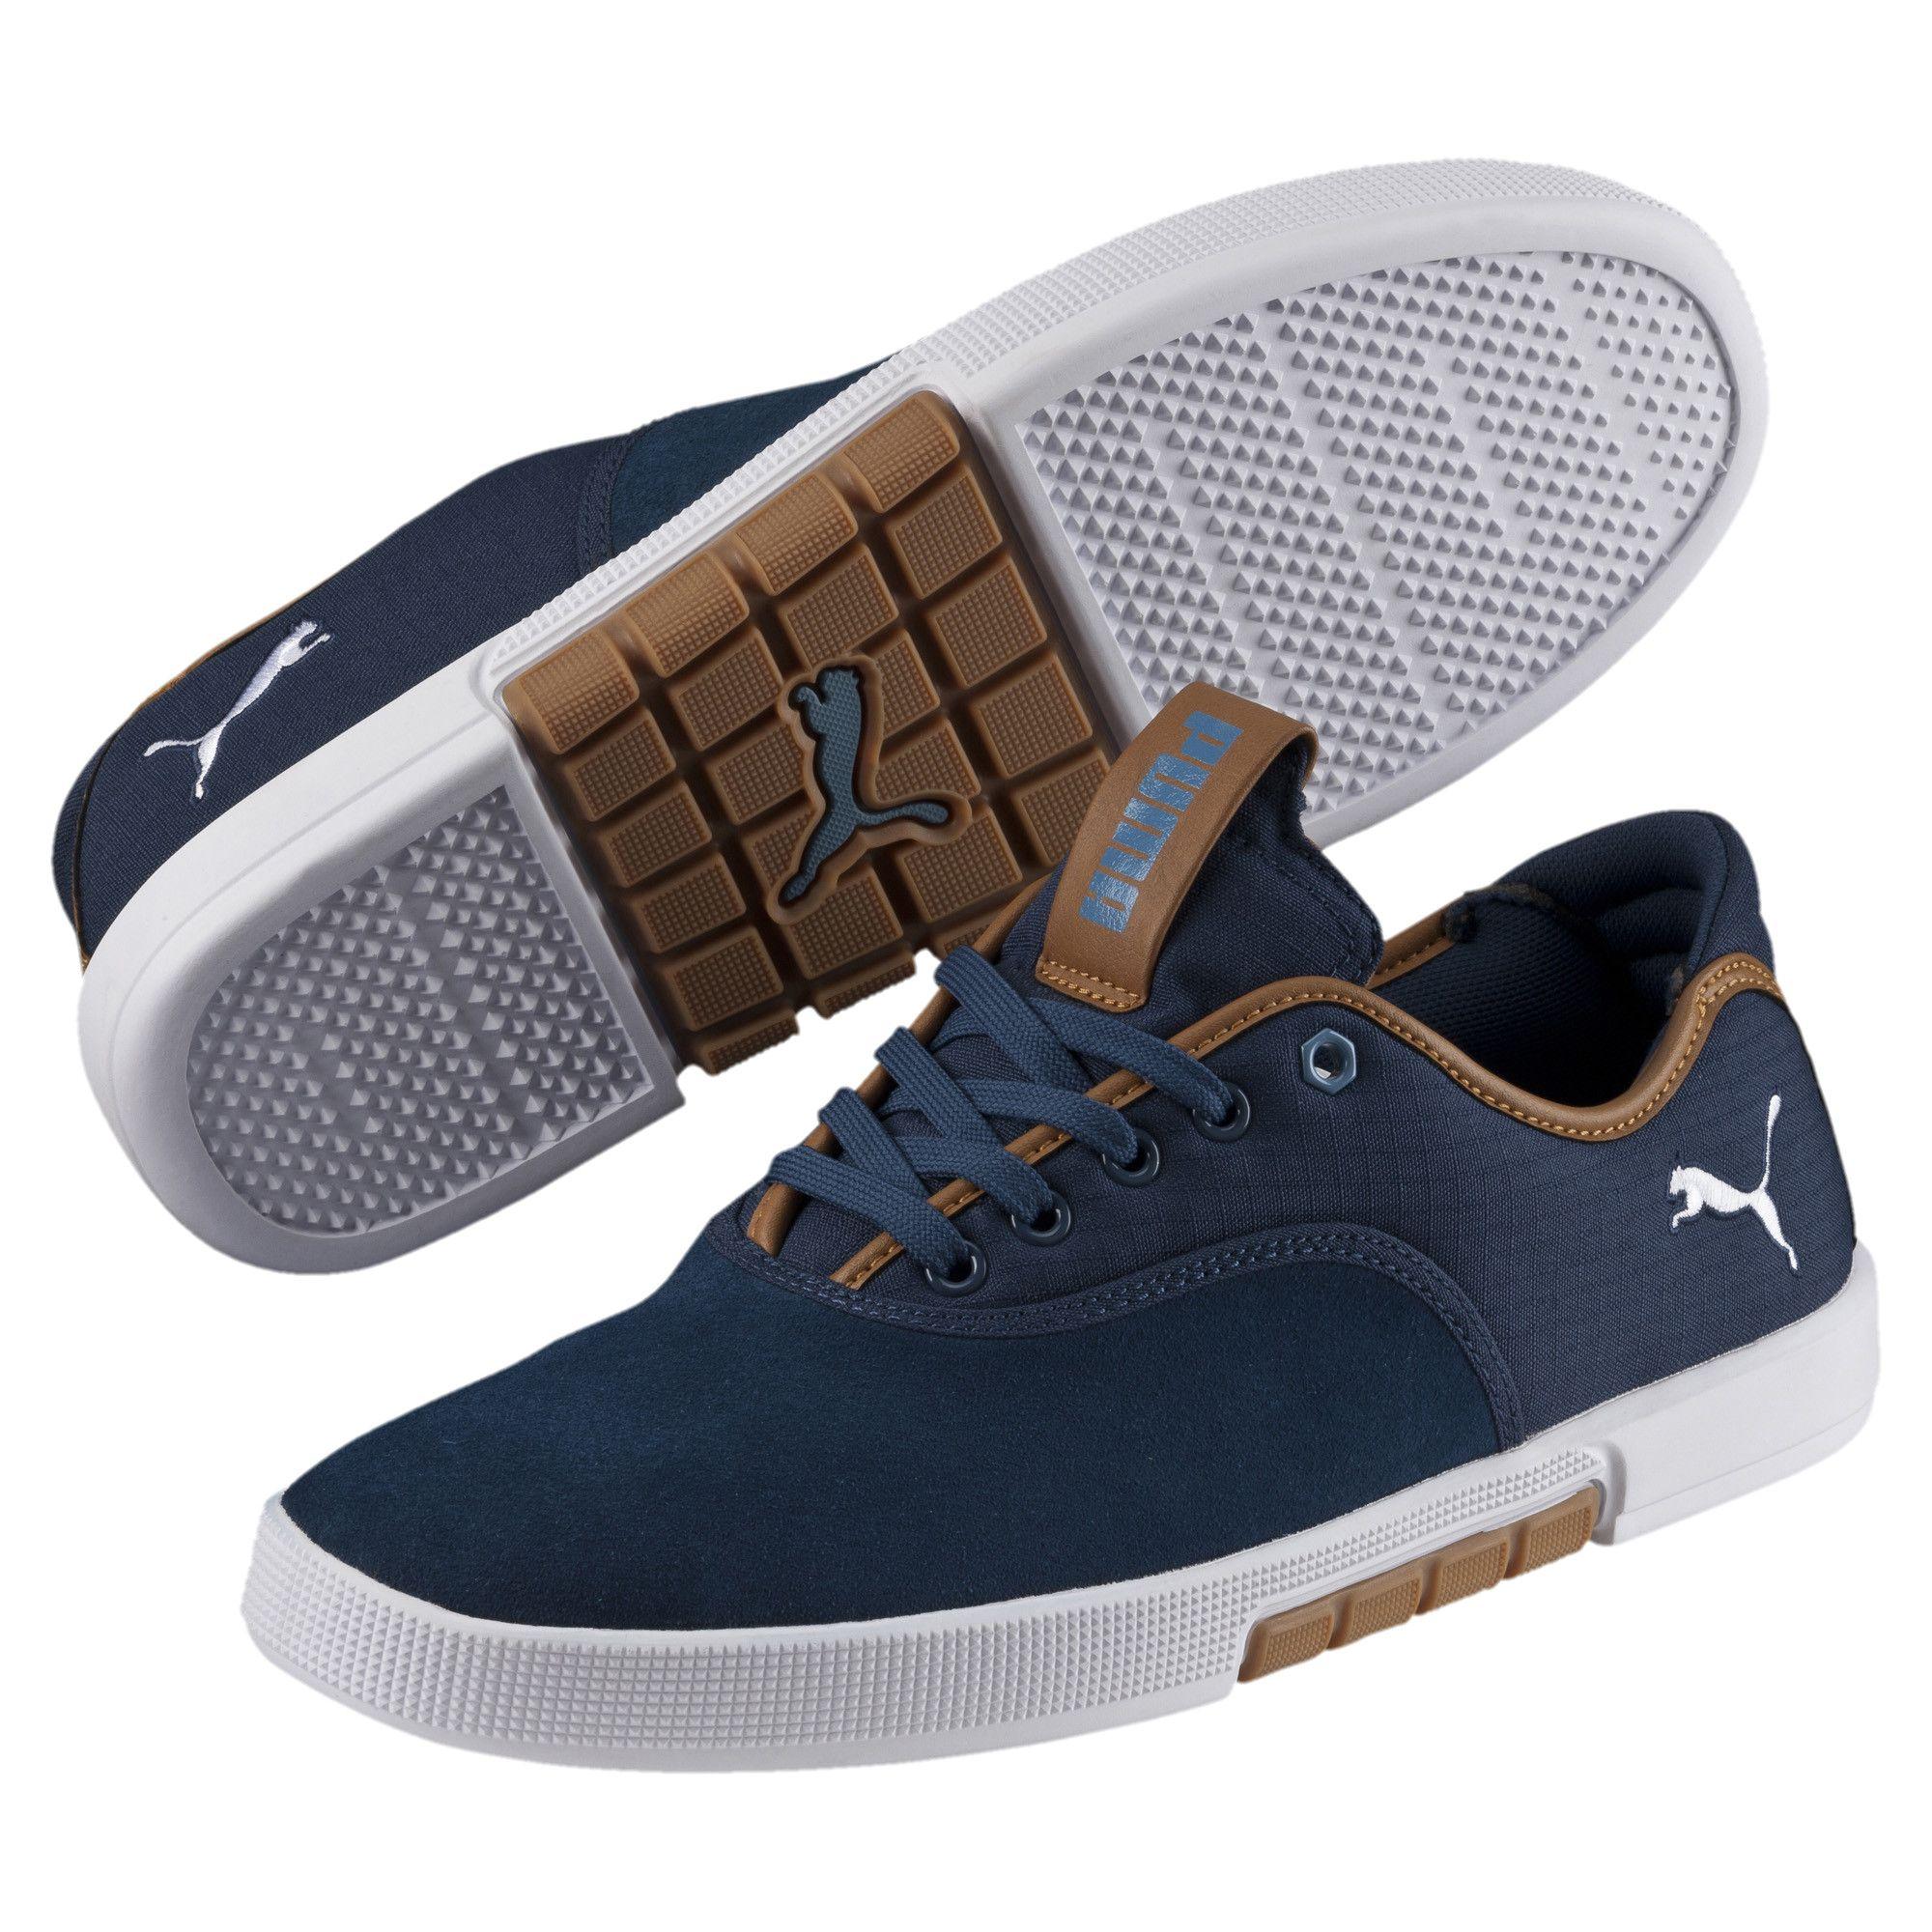 PUMA Funist Lo MU Men's Sneakers Men